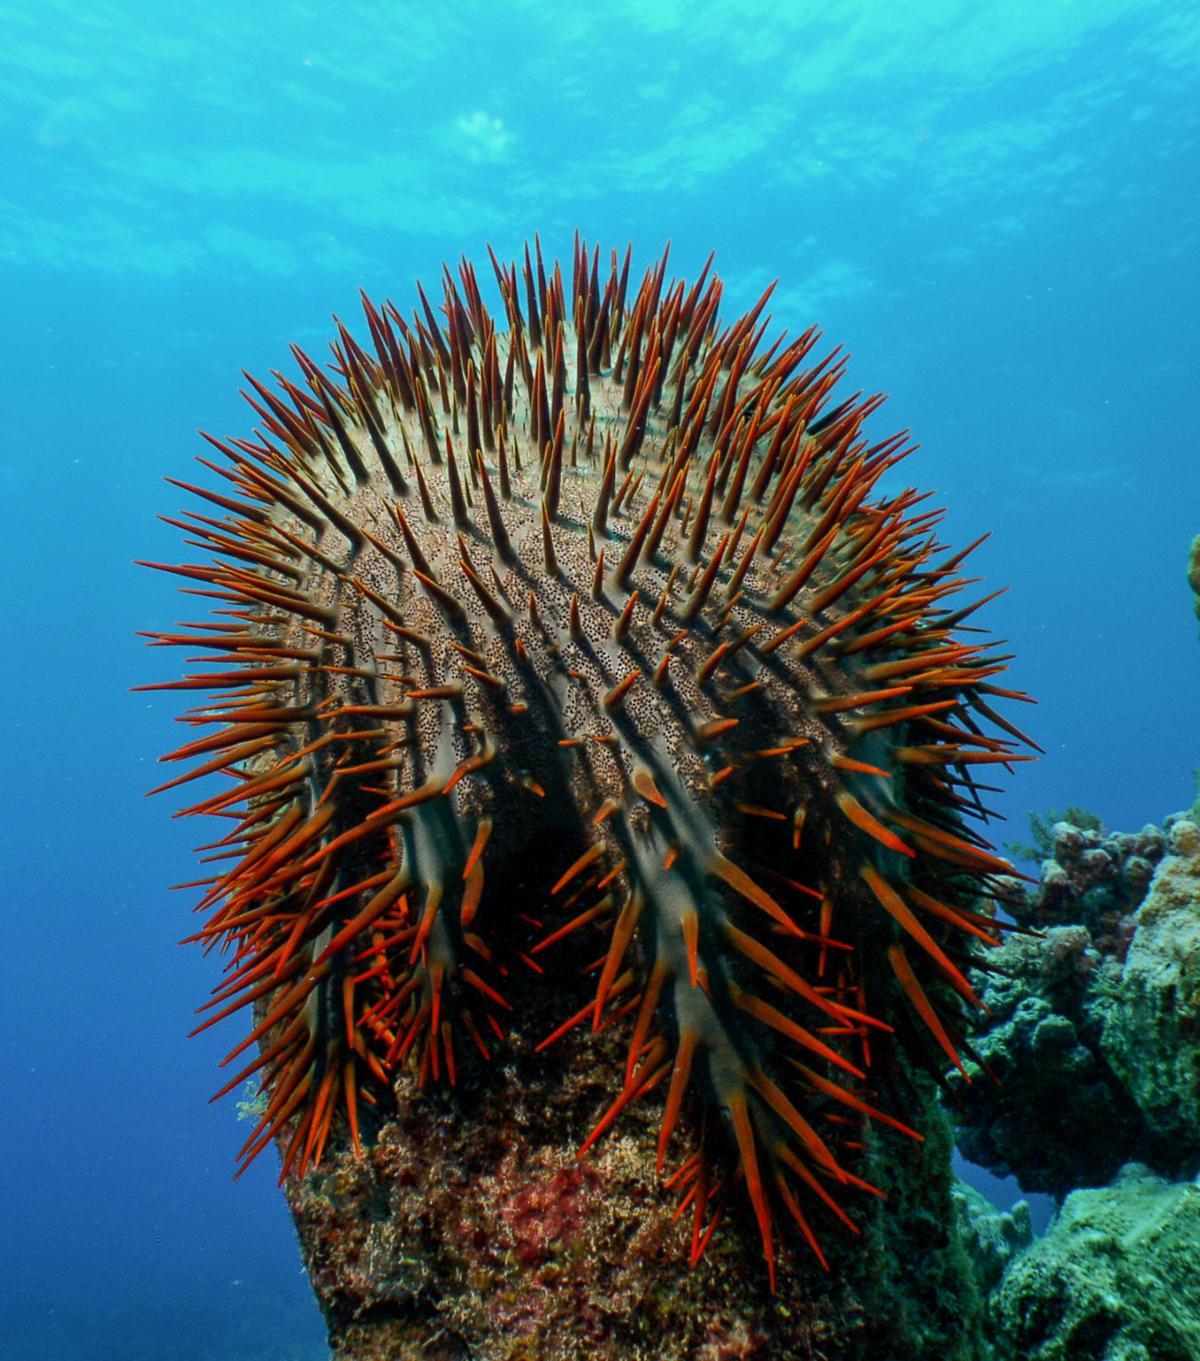 Reef response team calls on community as predator population spikes